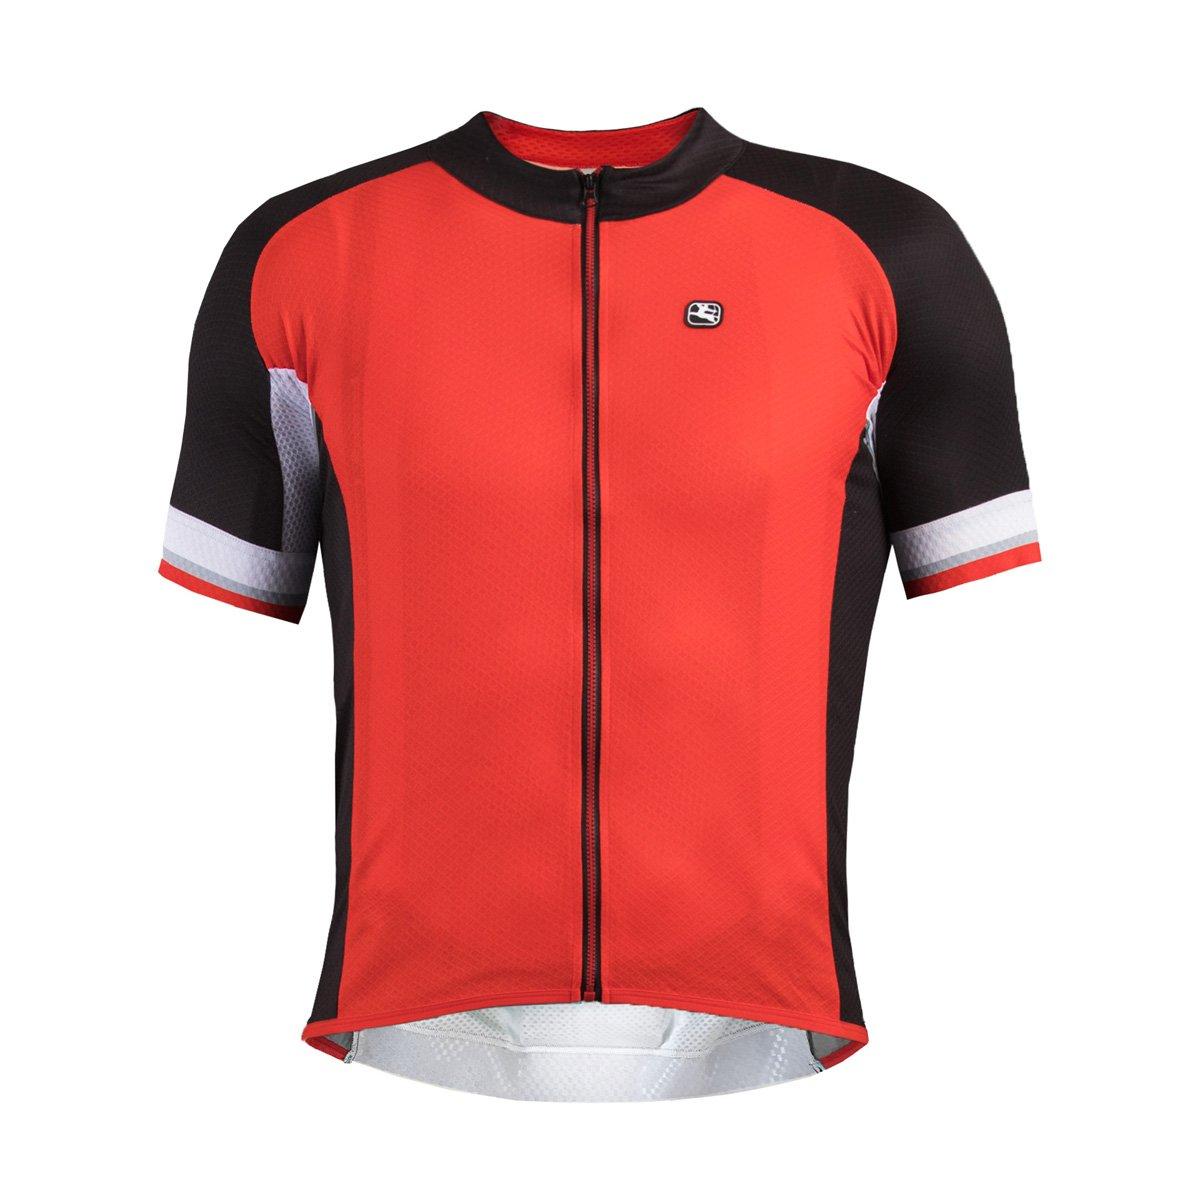 Giordana 2016メンズSilverline半袖サイクリングジャージー – gi-s6-ssjy-silv B077NXZ43H Medium|レッド/ブラック レッド/ブラック Medium